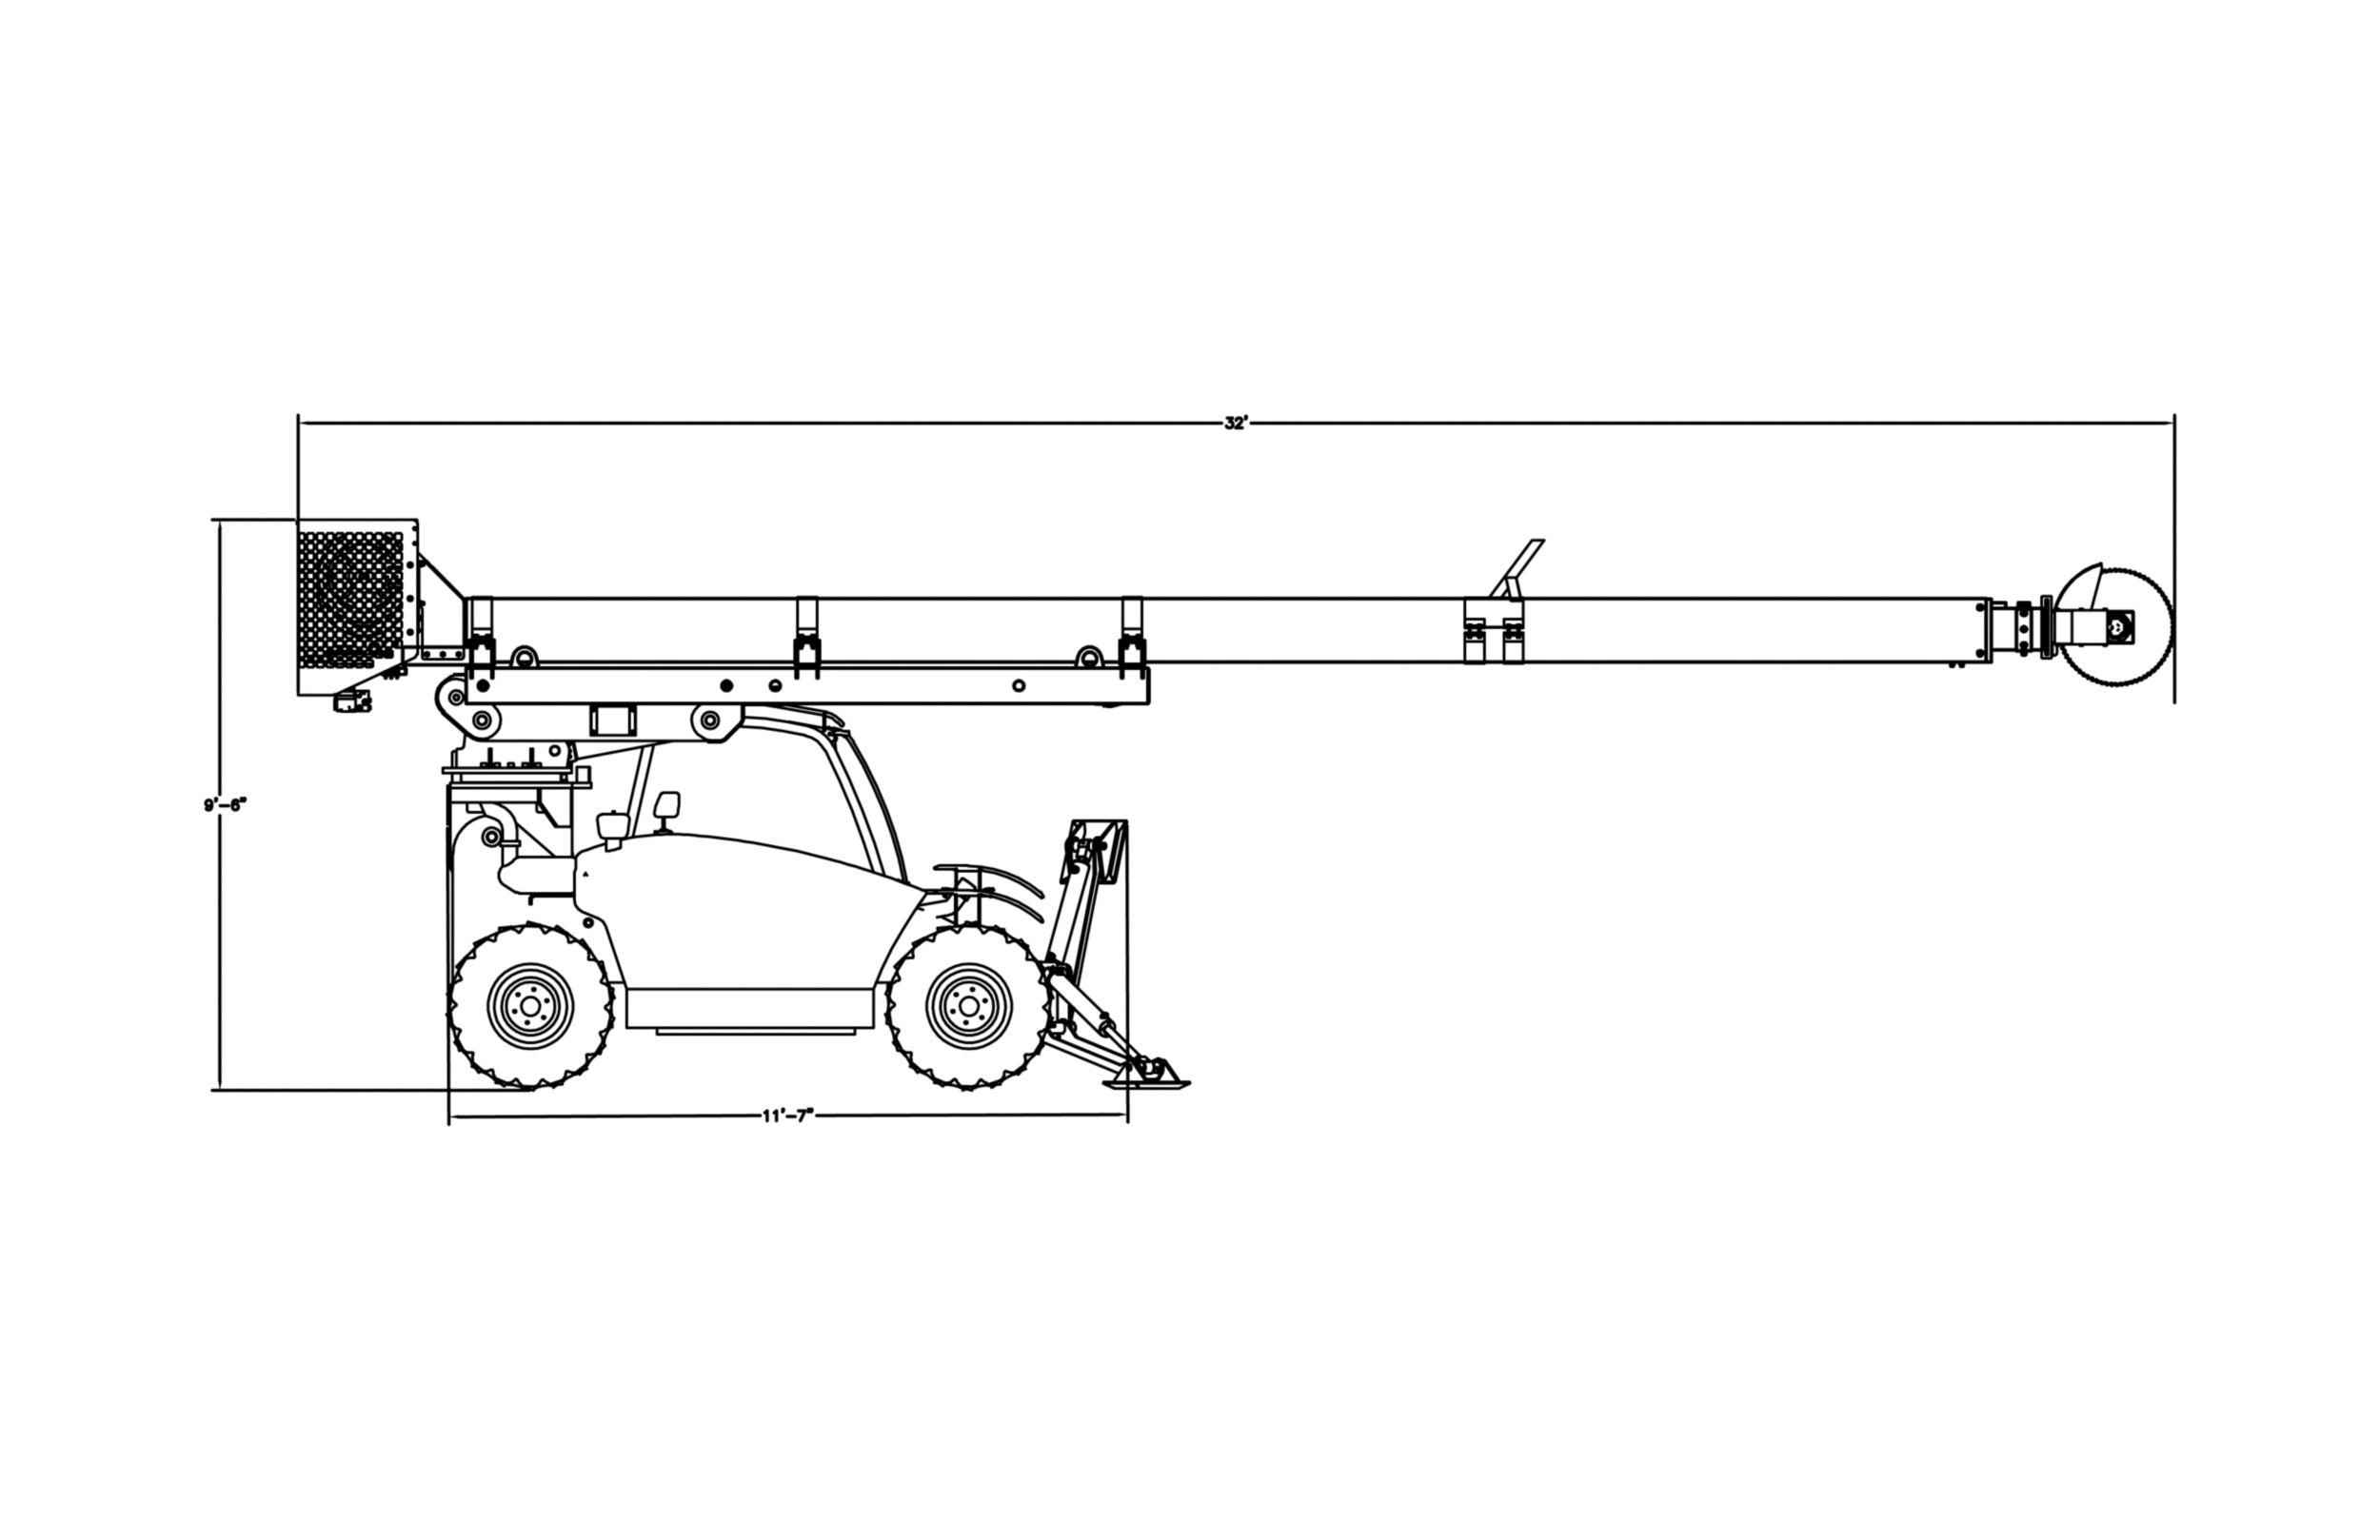 Skytrim Mini 55TH, Mechanical Tree Trimmer